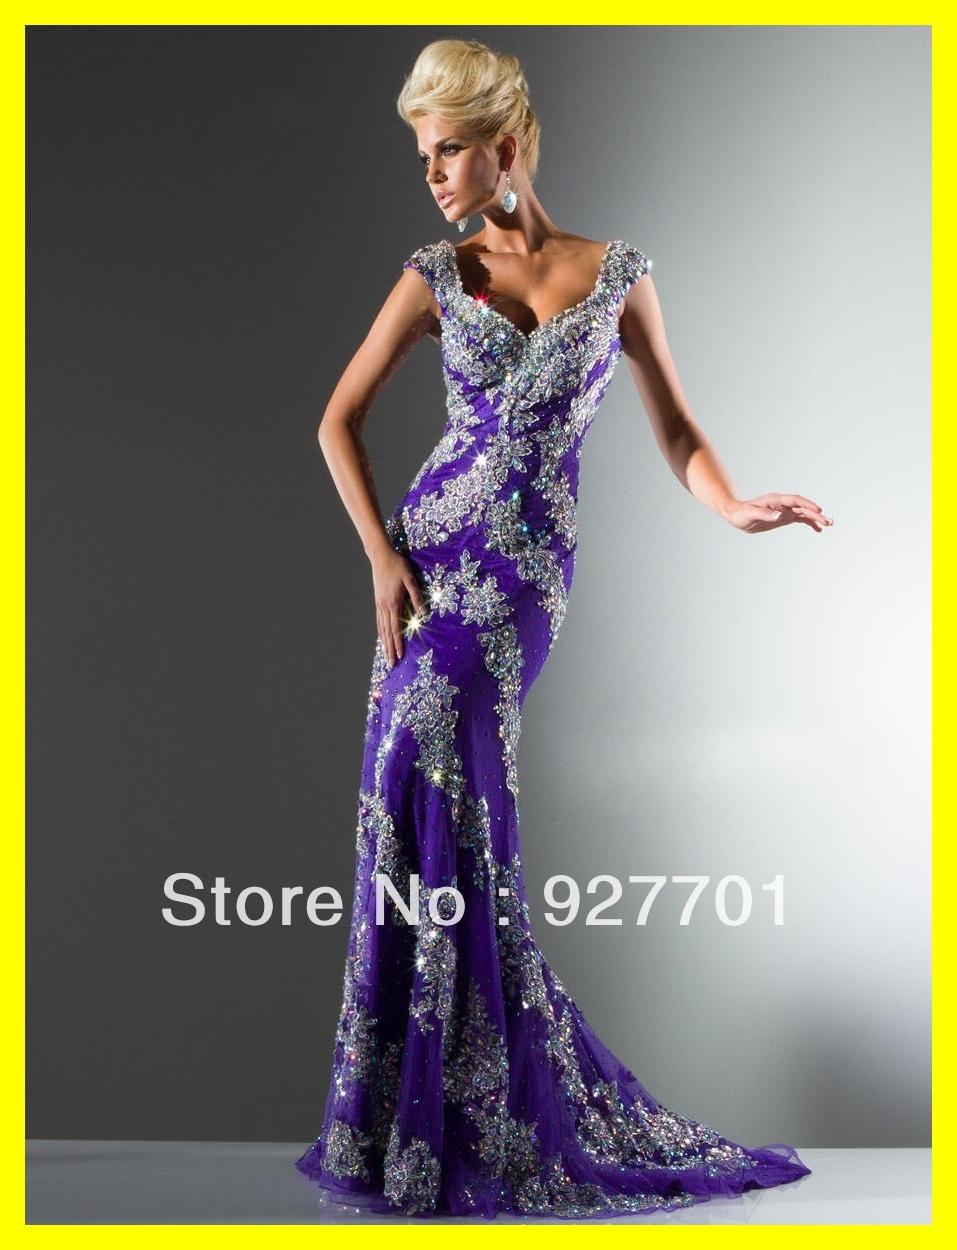 Buy beautiful dresses online